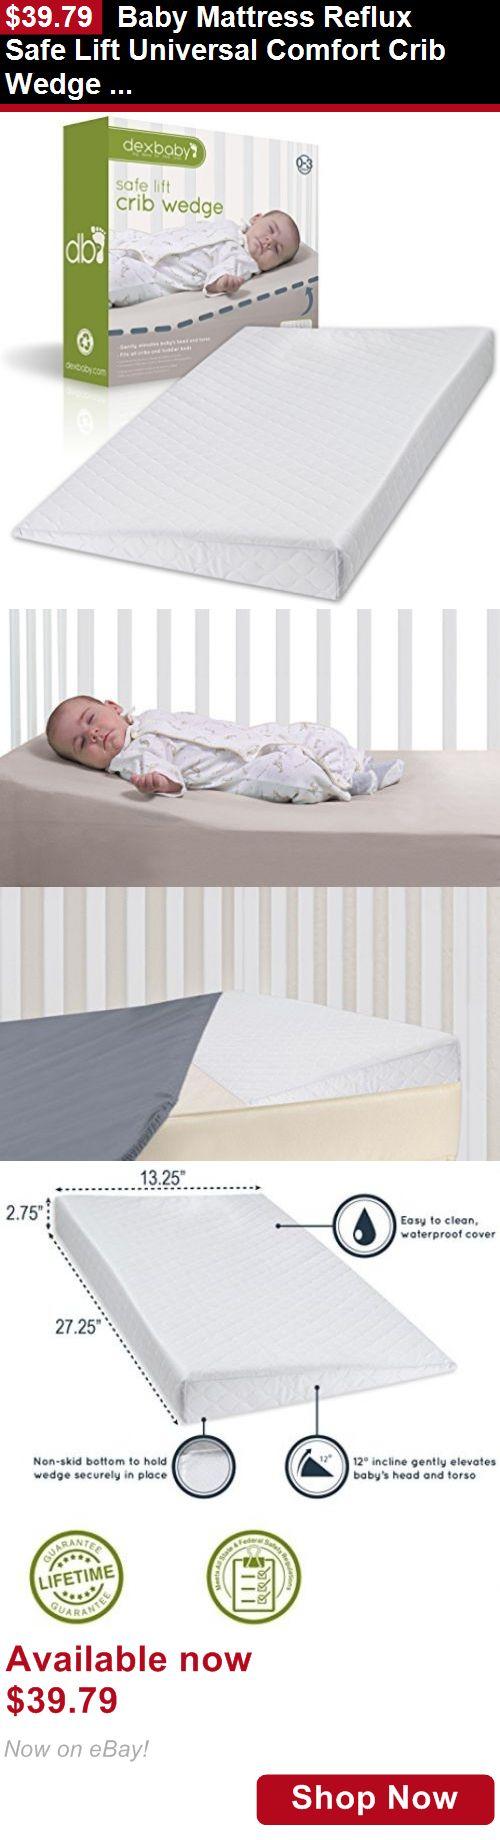 Baby Safety Sleep Positioners Mattress Reflux Safe Lift Universal Comfort Crib Wedge Positioner